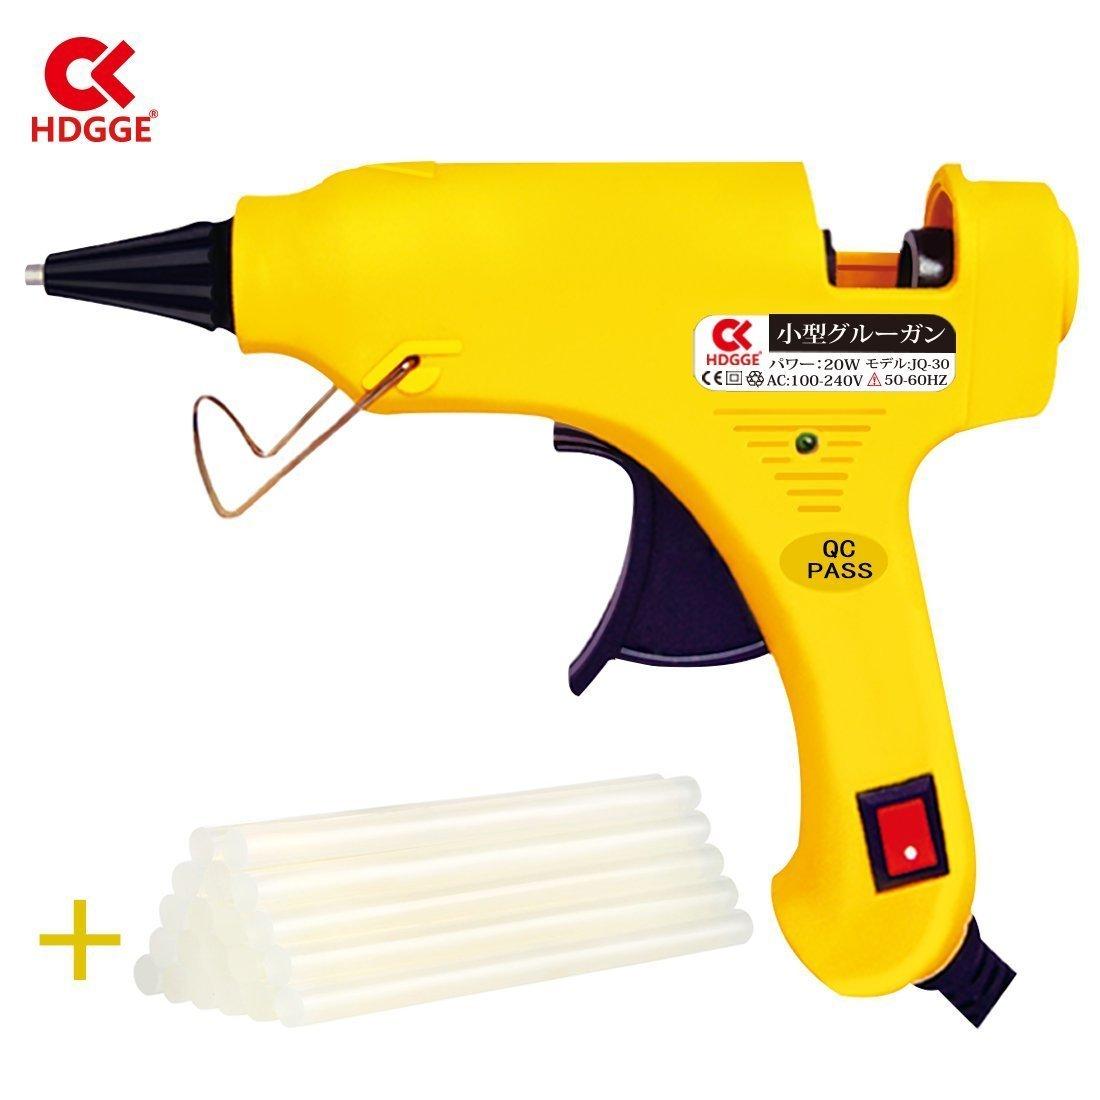 Mini Hot Melt Glue Gun with 35pcs Glue Sticks High Temperature Melting Glue Gun Kit Flexible Trigger for DIY... by HDGGE